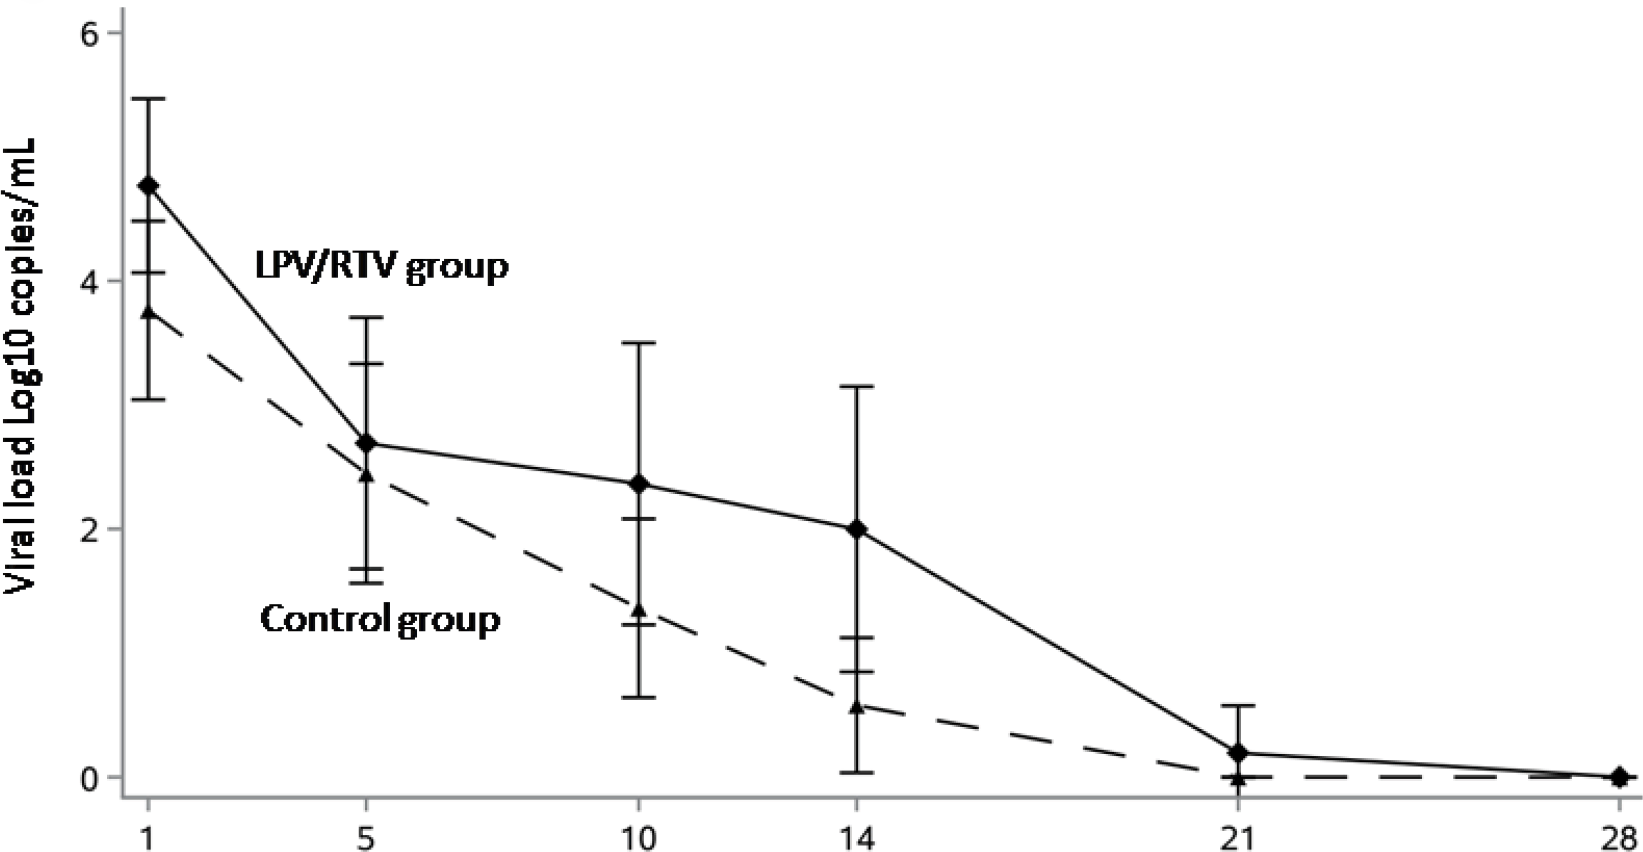 chictr2000029308 results 10 - Коронавирус. Лекарства. Лопинавир и ритонавир не помогли в лечении COVID-19